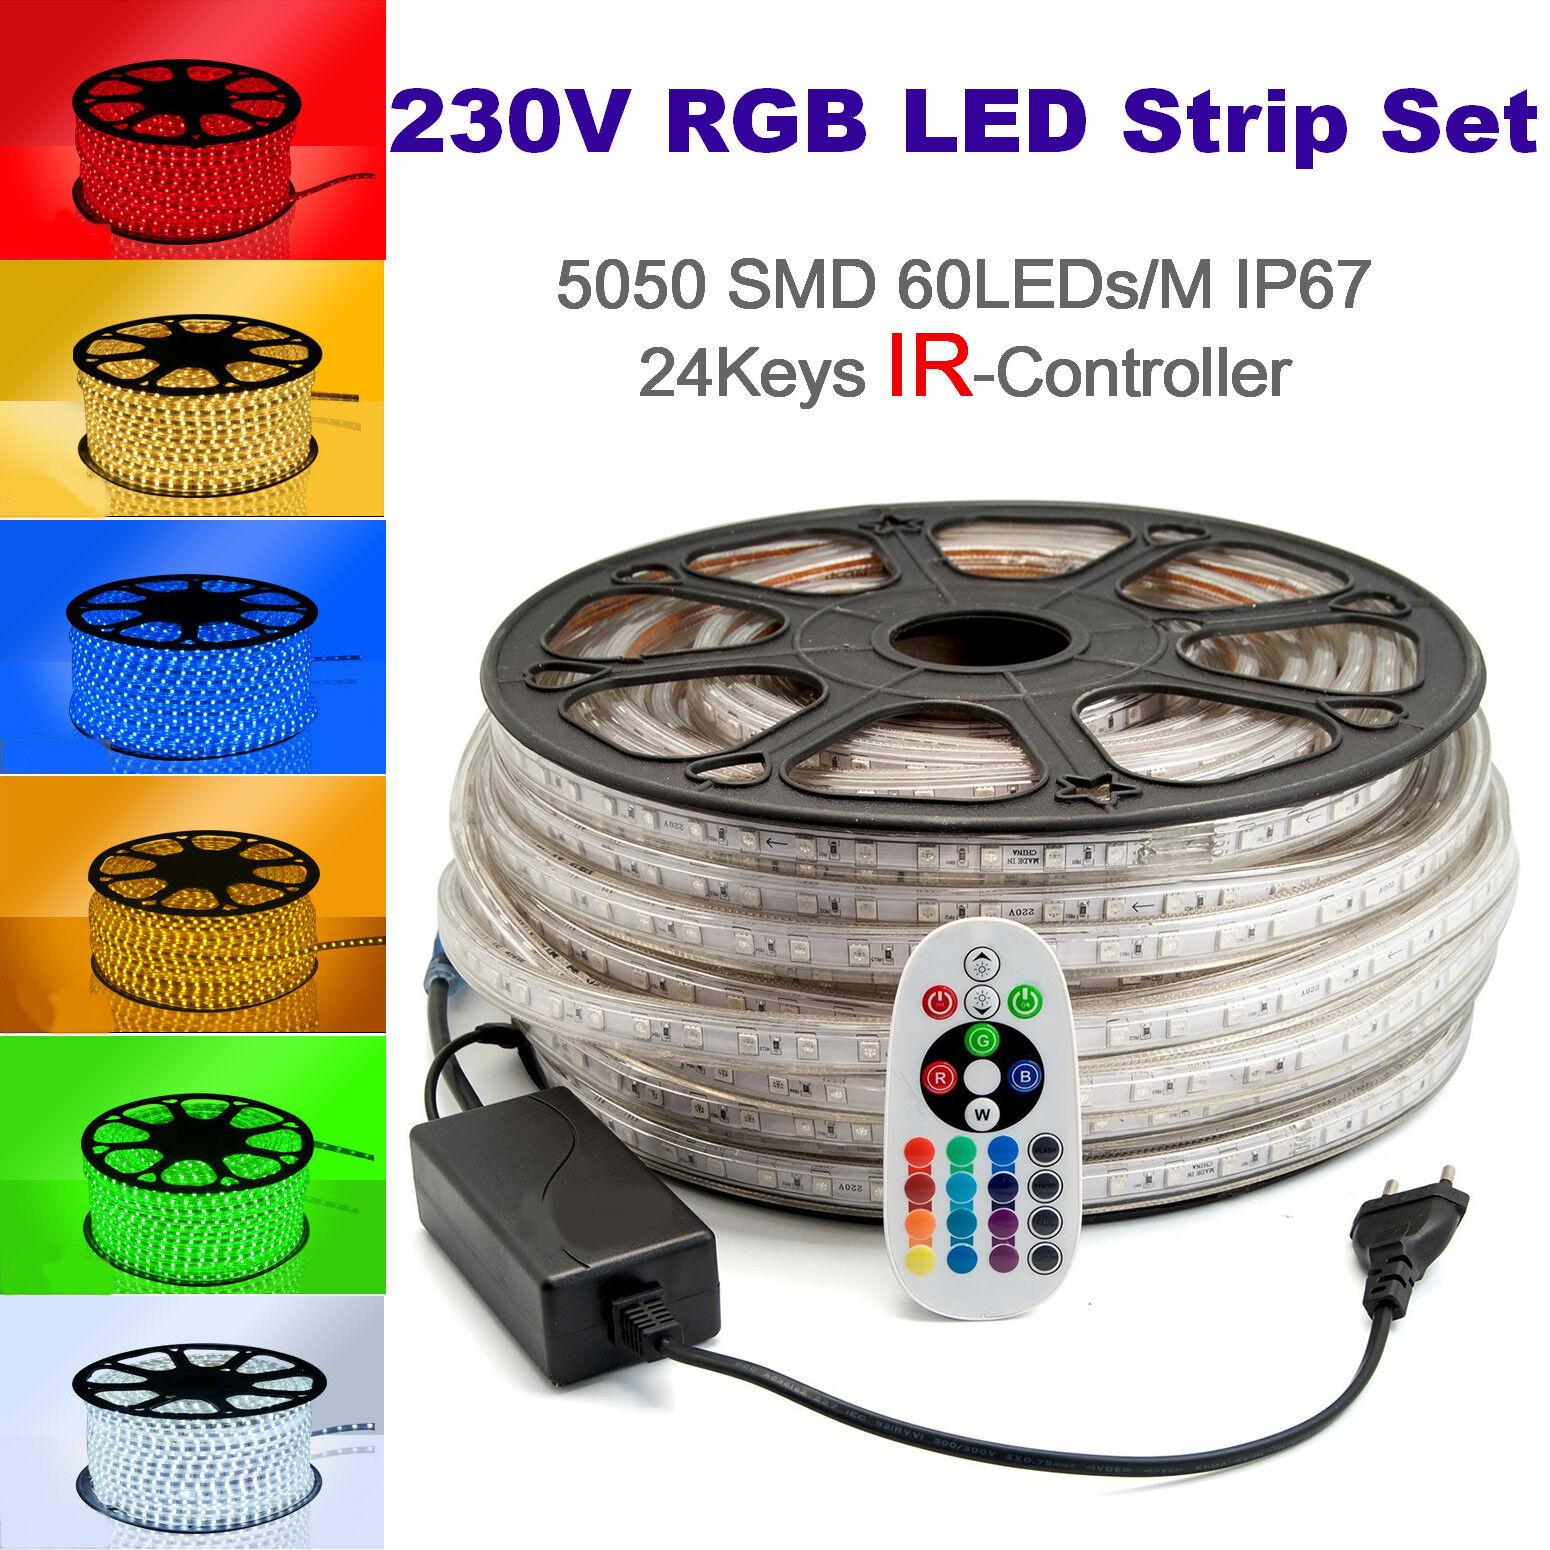 15 Meter 230V LED RGB Strip Streifen 60 LEDs M IP67 IR Controller Dimmbar B-Ware